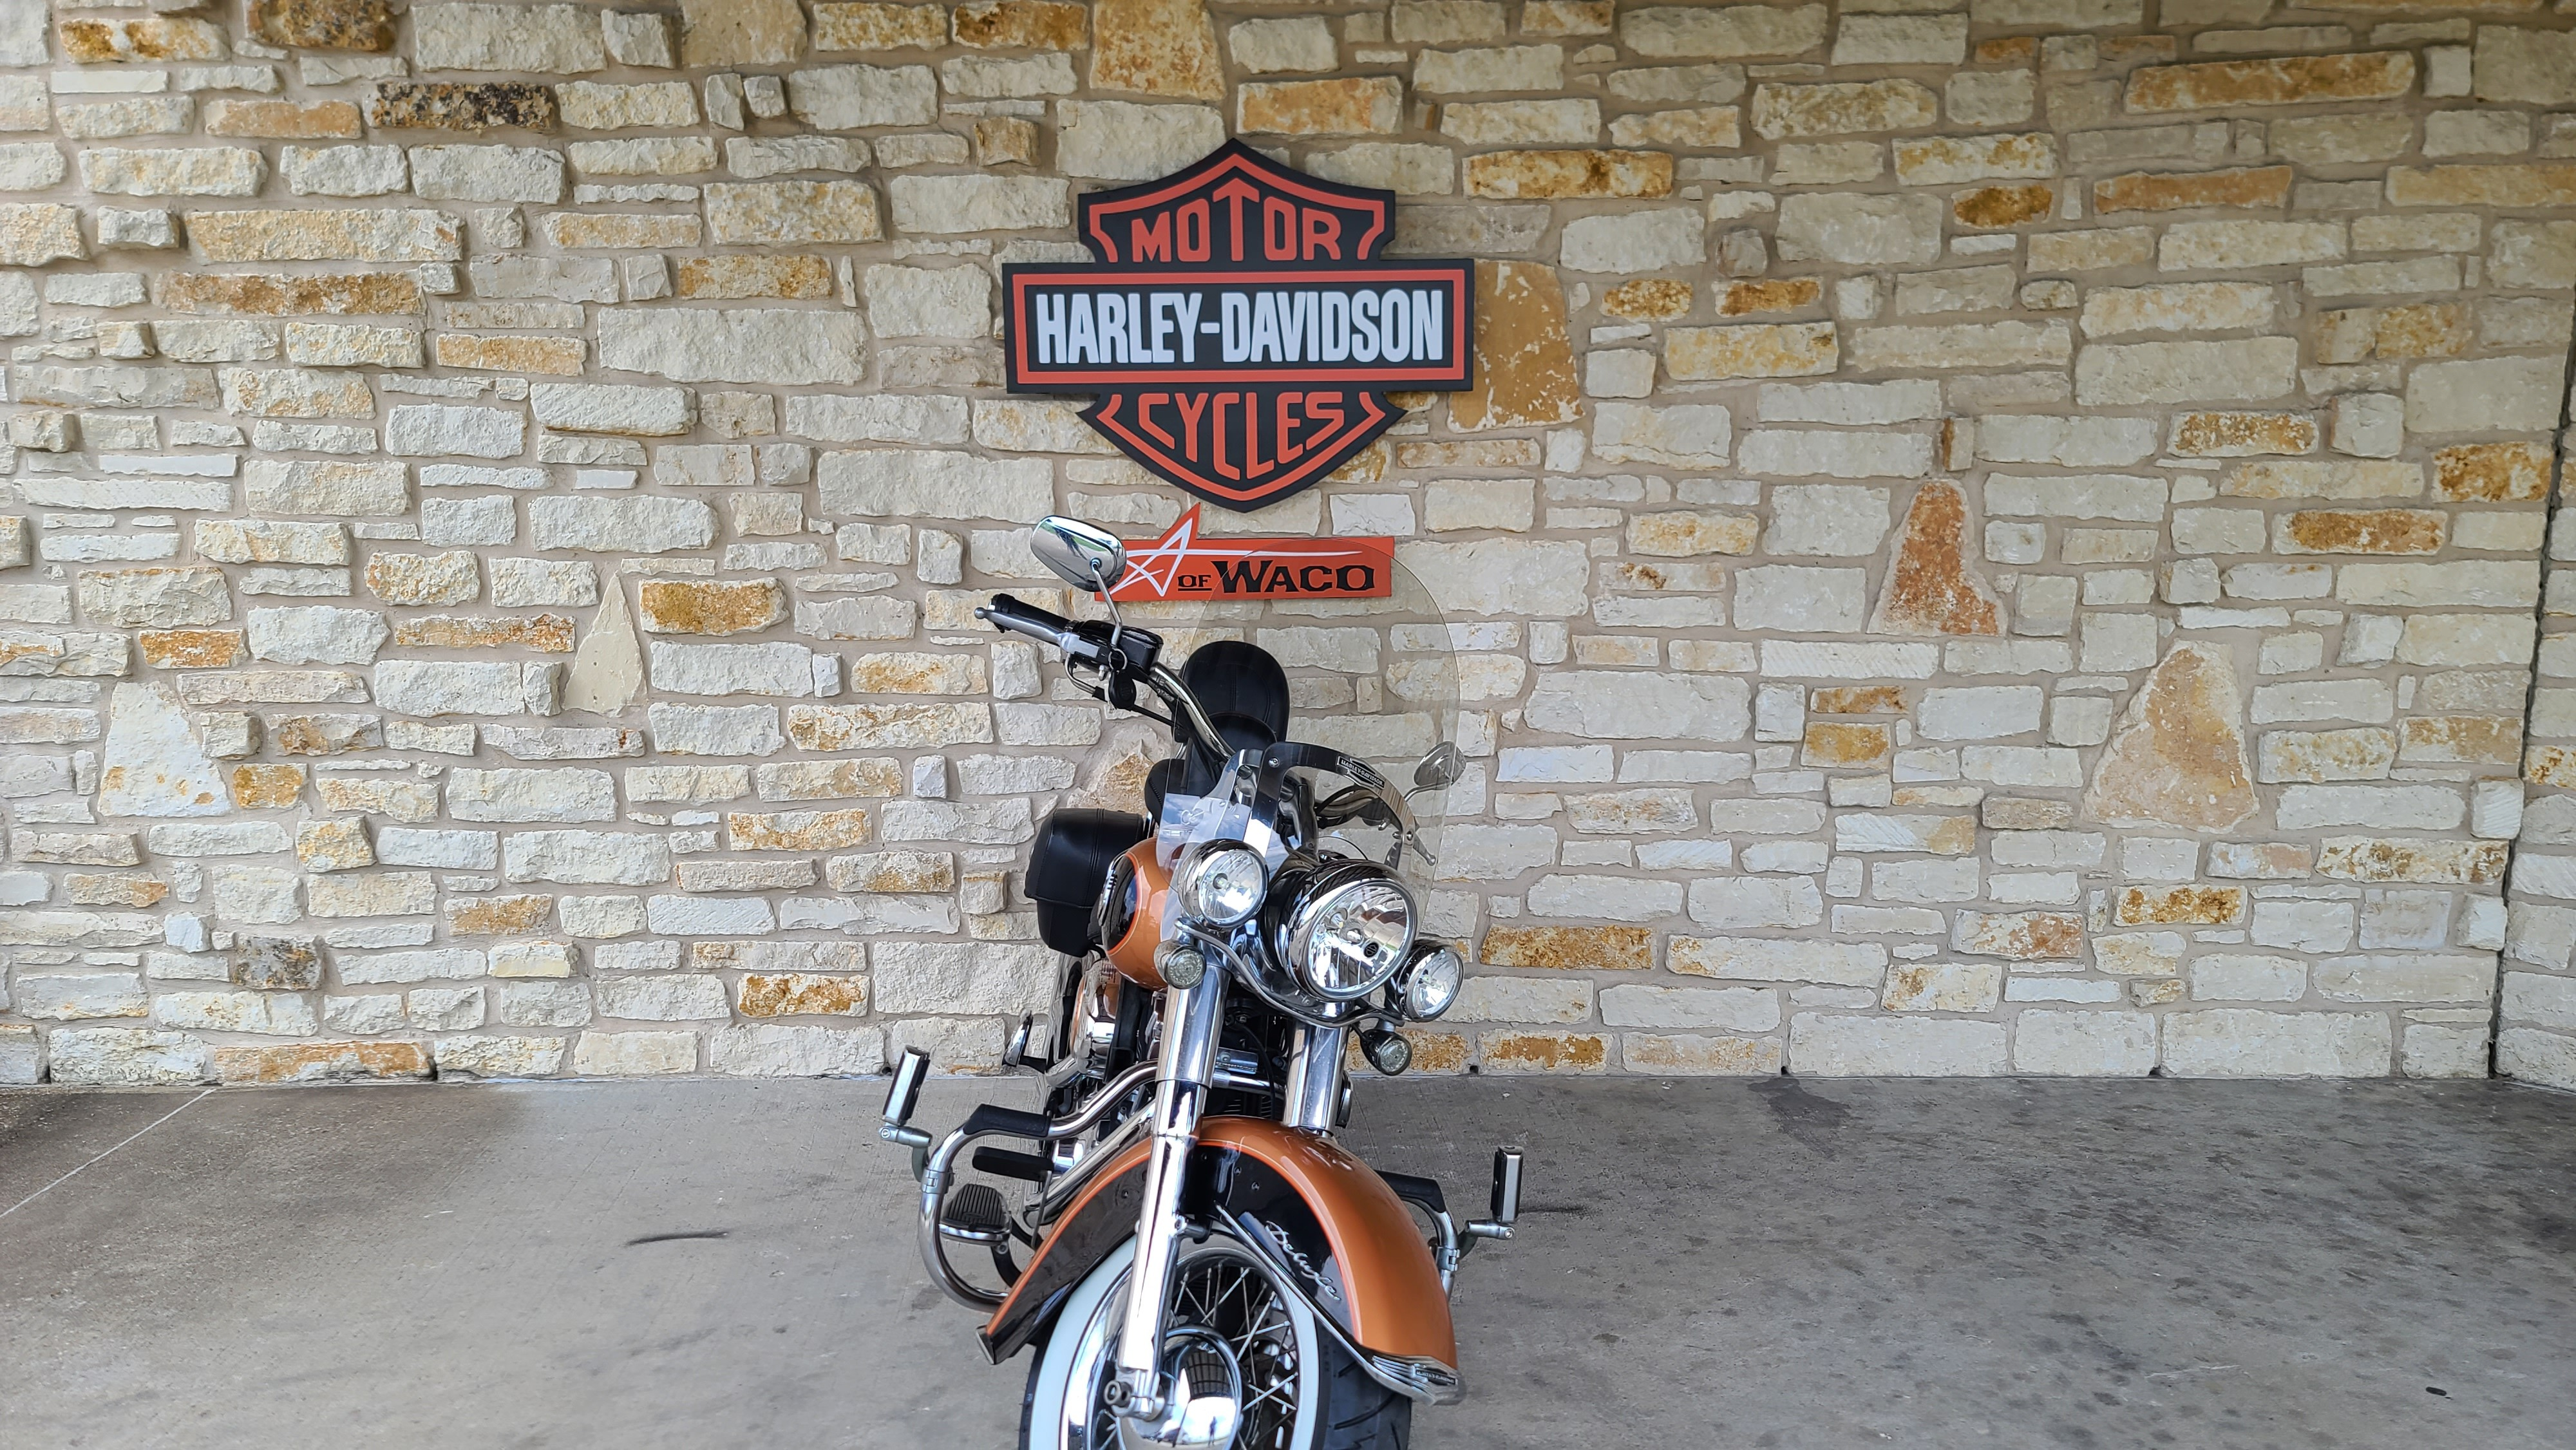 2008 Harley-Davidson Softail Deluxe at Harley-Davidson of Waco